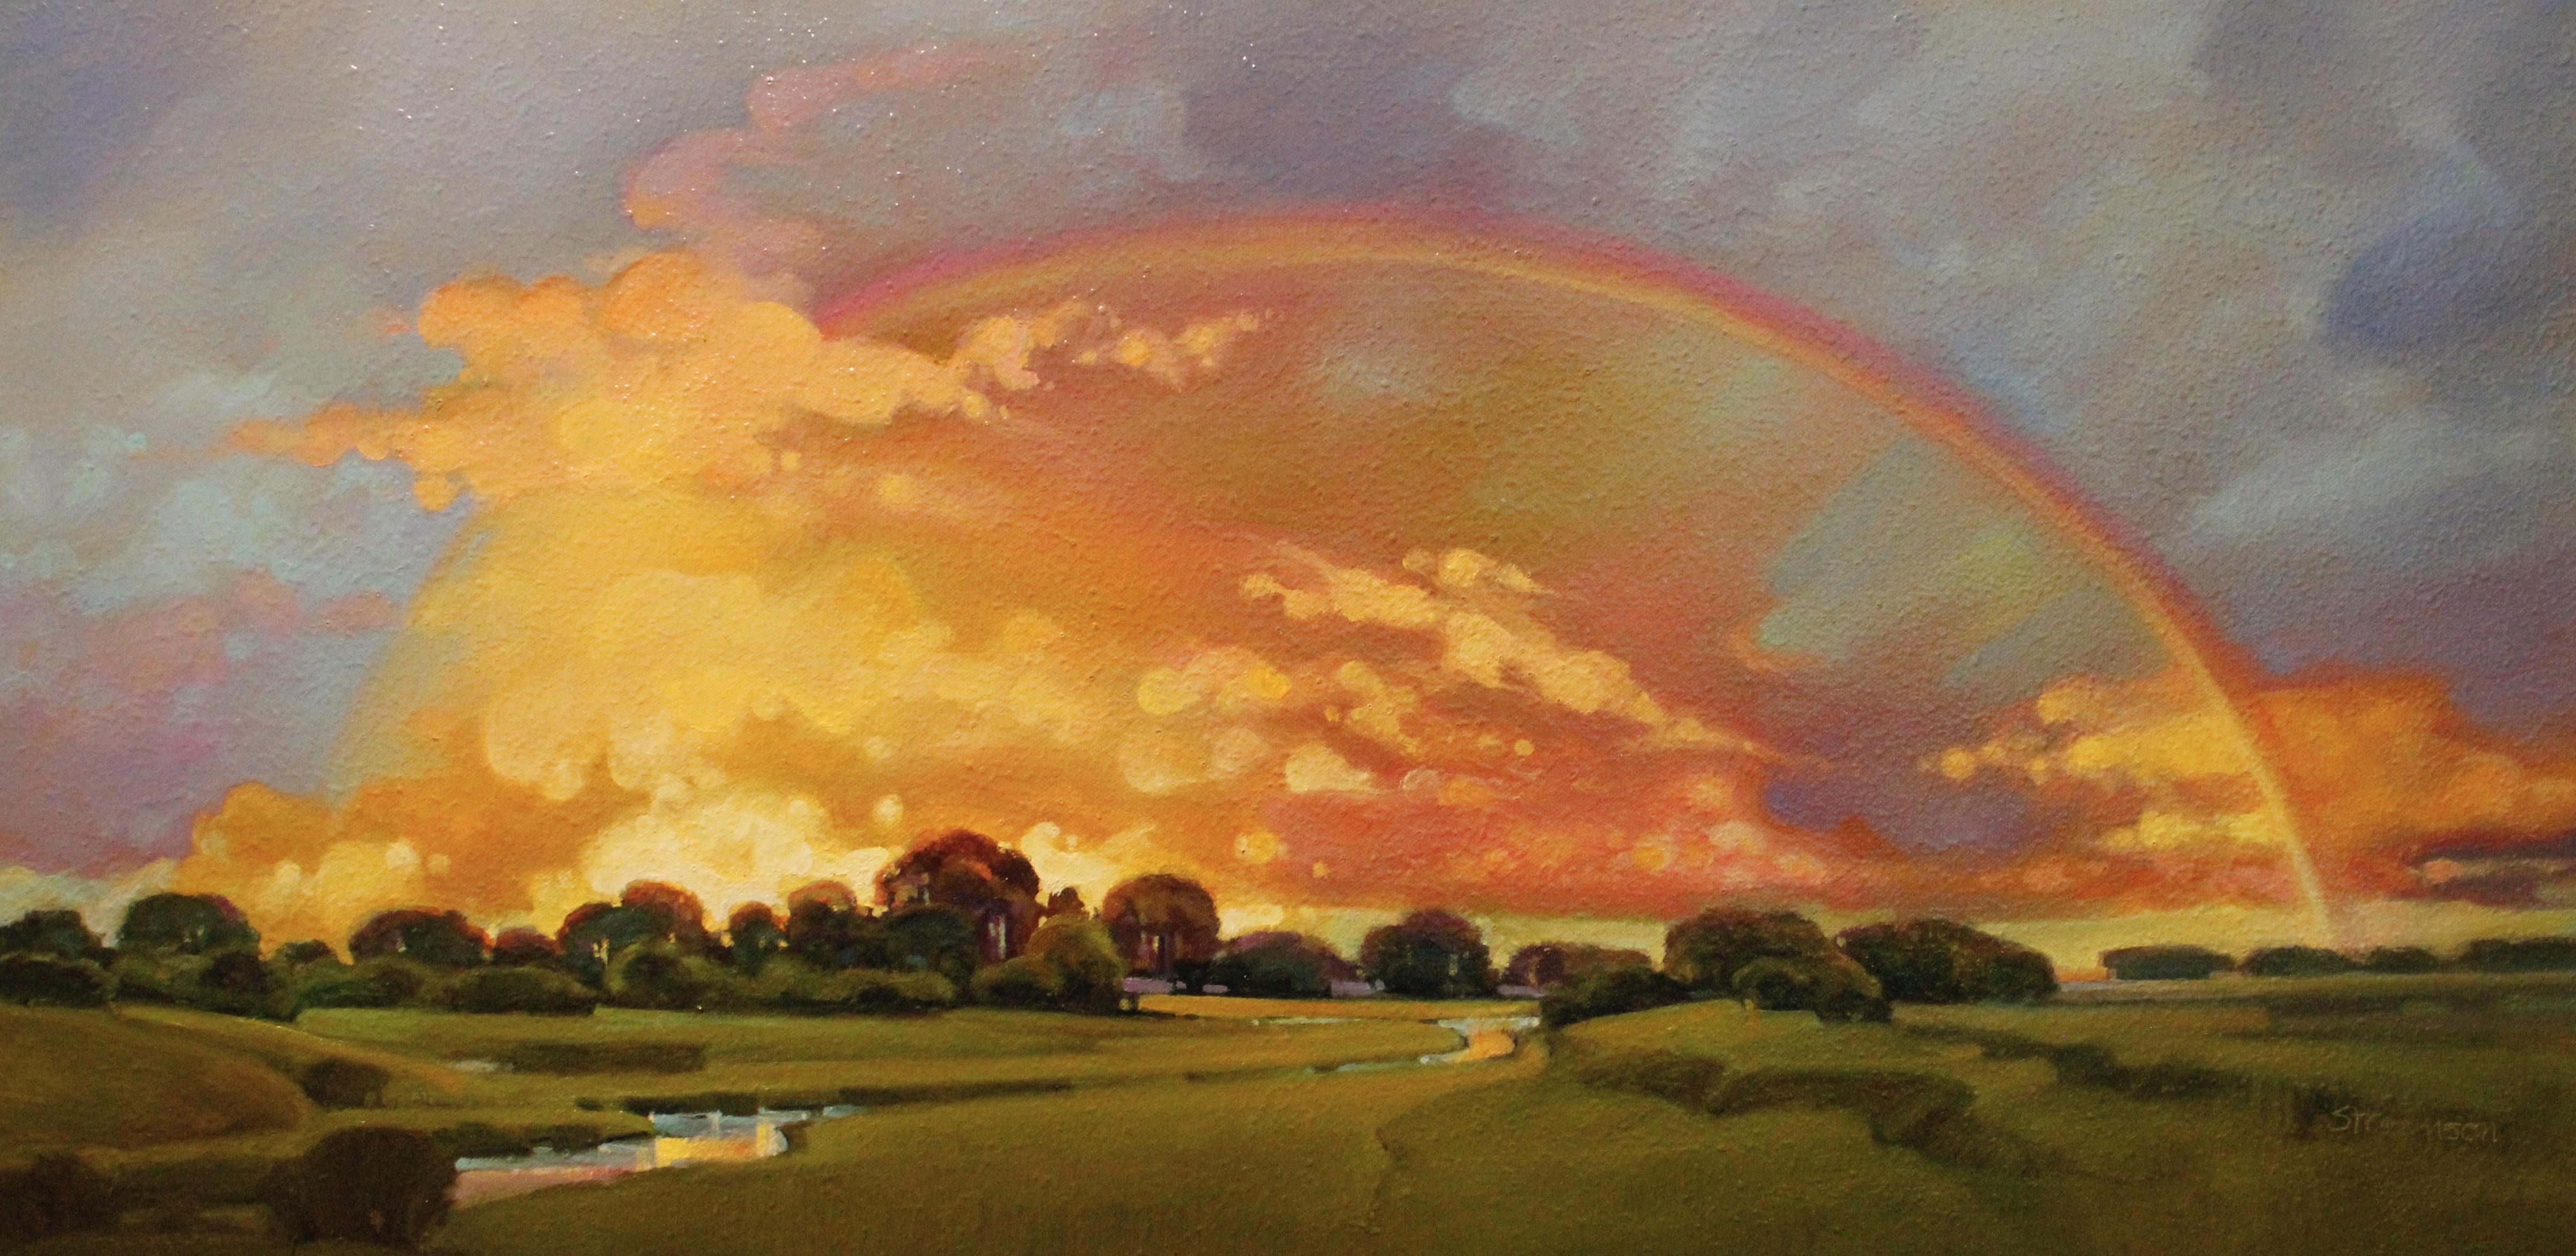 The Paintings of Mac Stevenson